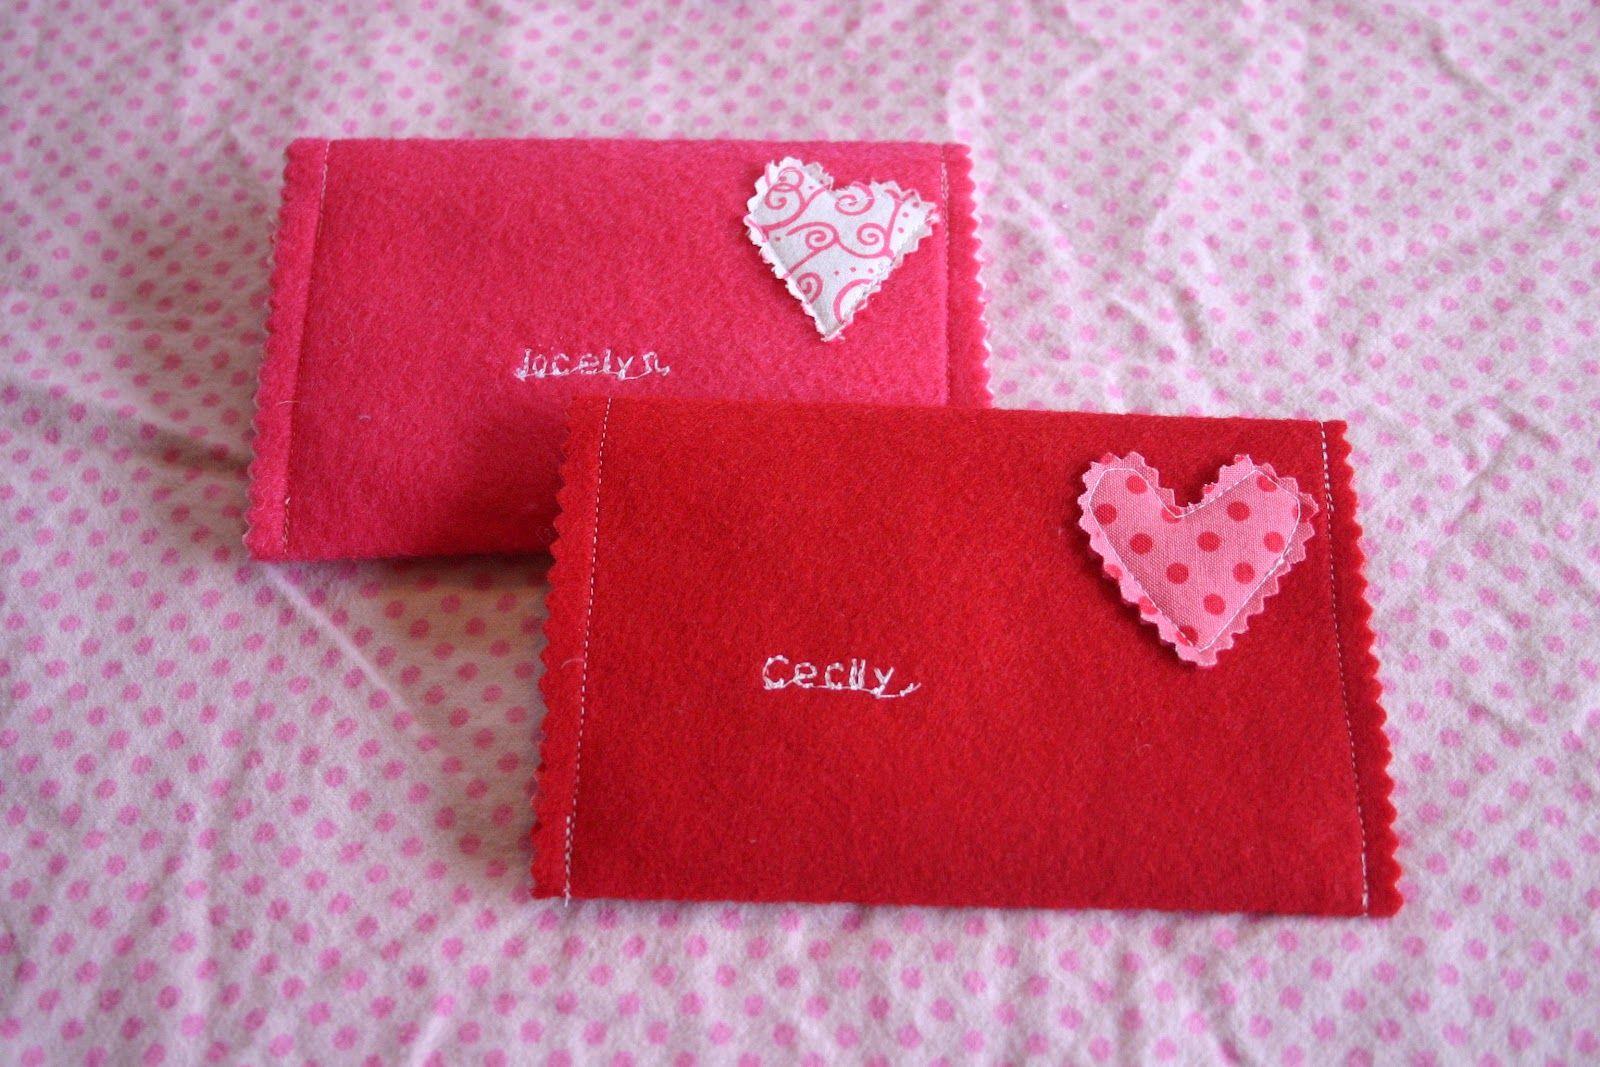 I Ve Seen A Few Version Of Felt Envelopes Floating Around Blogland So I Thought I D Try To Make My Own Jocelyn S P Valentines Envelopes Felt Envelope Envelope